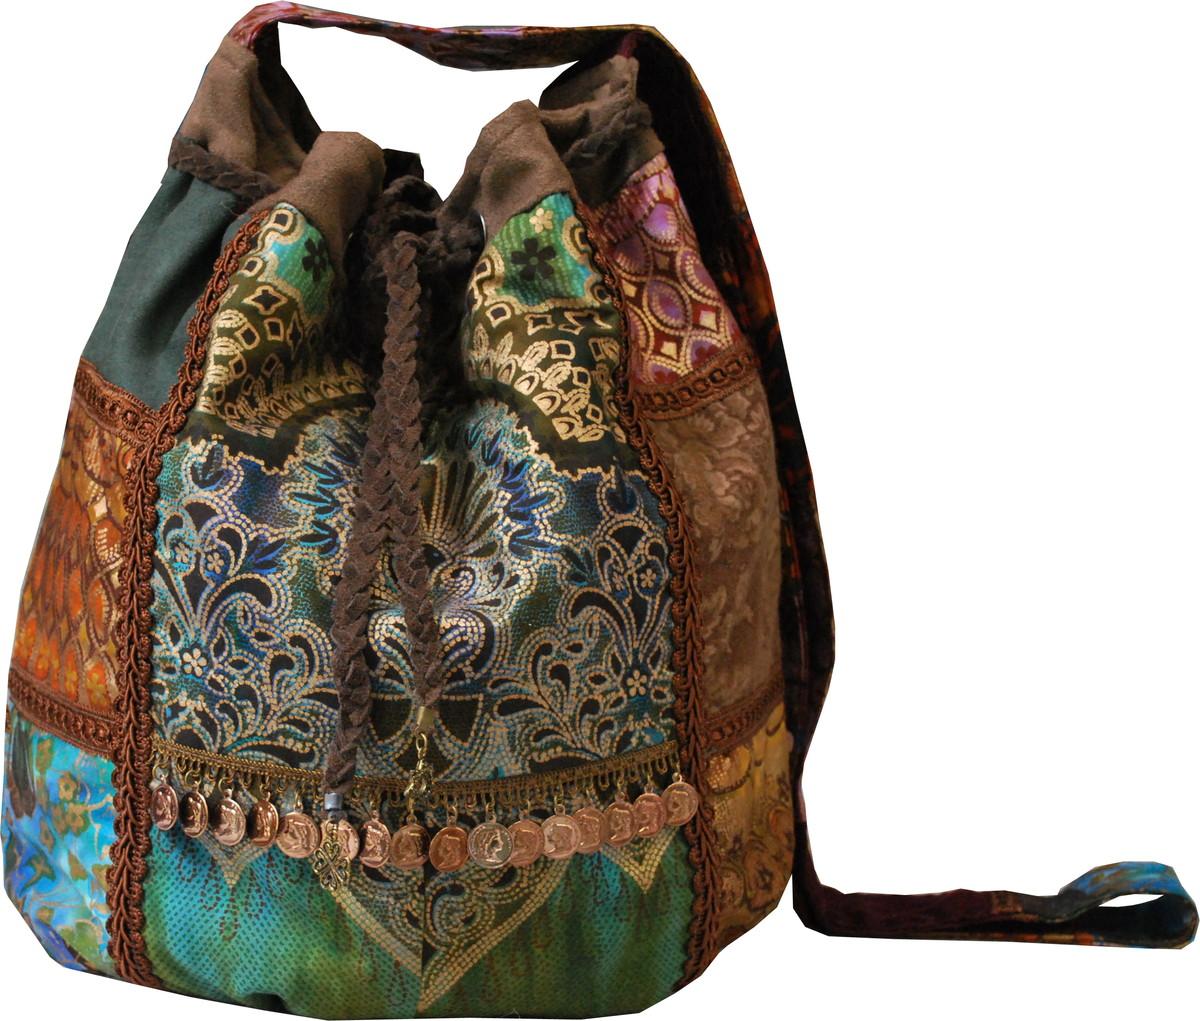 Bolsa De Tecido Hippie : Hippie chic dominando nas bolsas cintos e ?culos